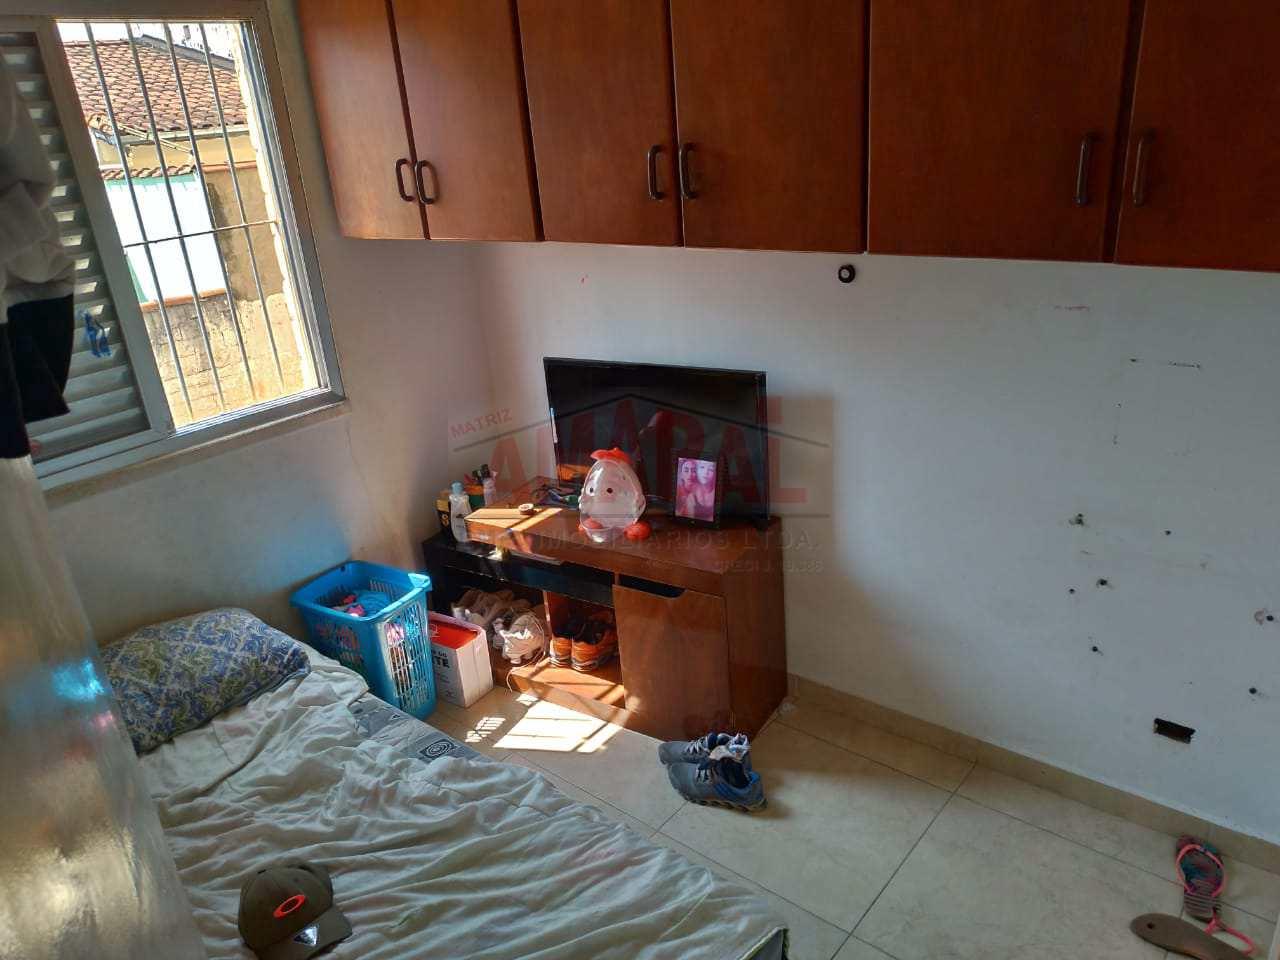 Apartamento com 2 dorms, Cidade Satélite Santa Bárbara, São Paulo - R$ 155 mil, Cod: 11276